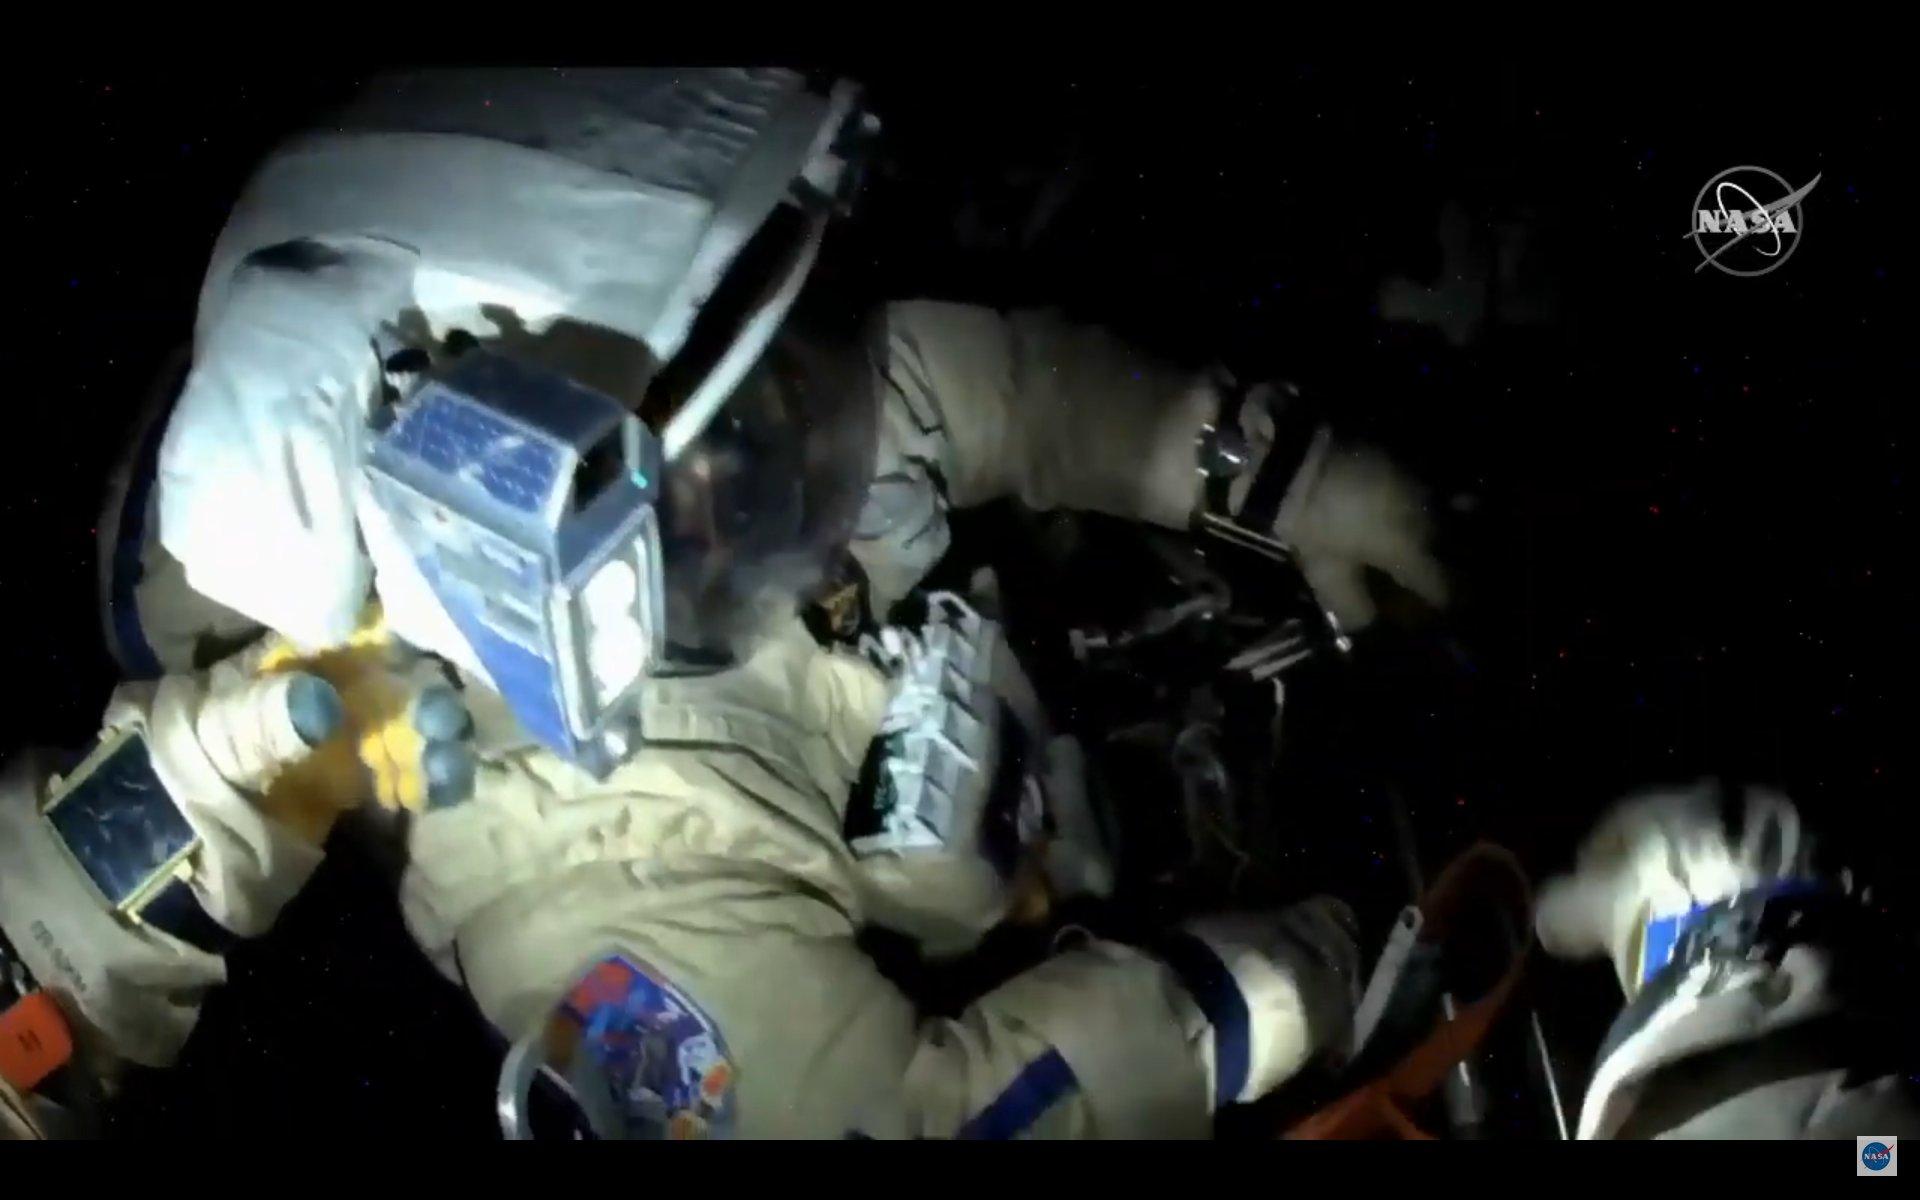 2021-2-june-russians-spacewalk.jpg